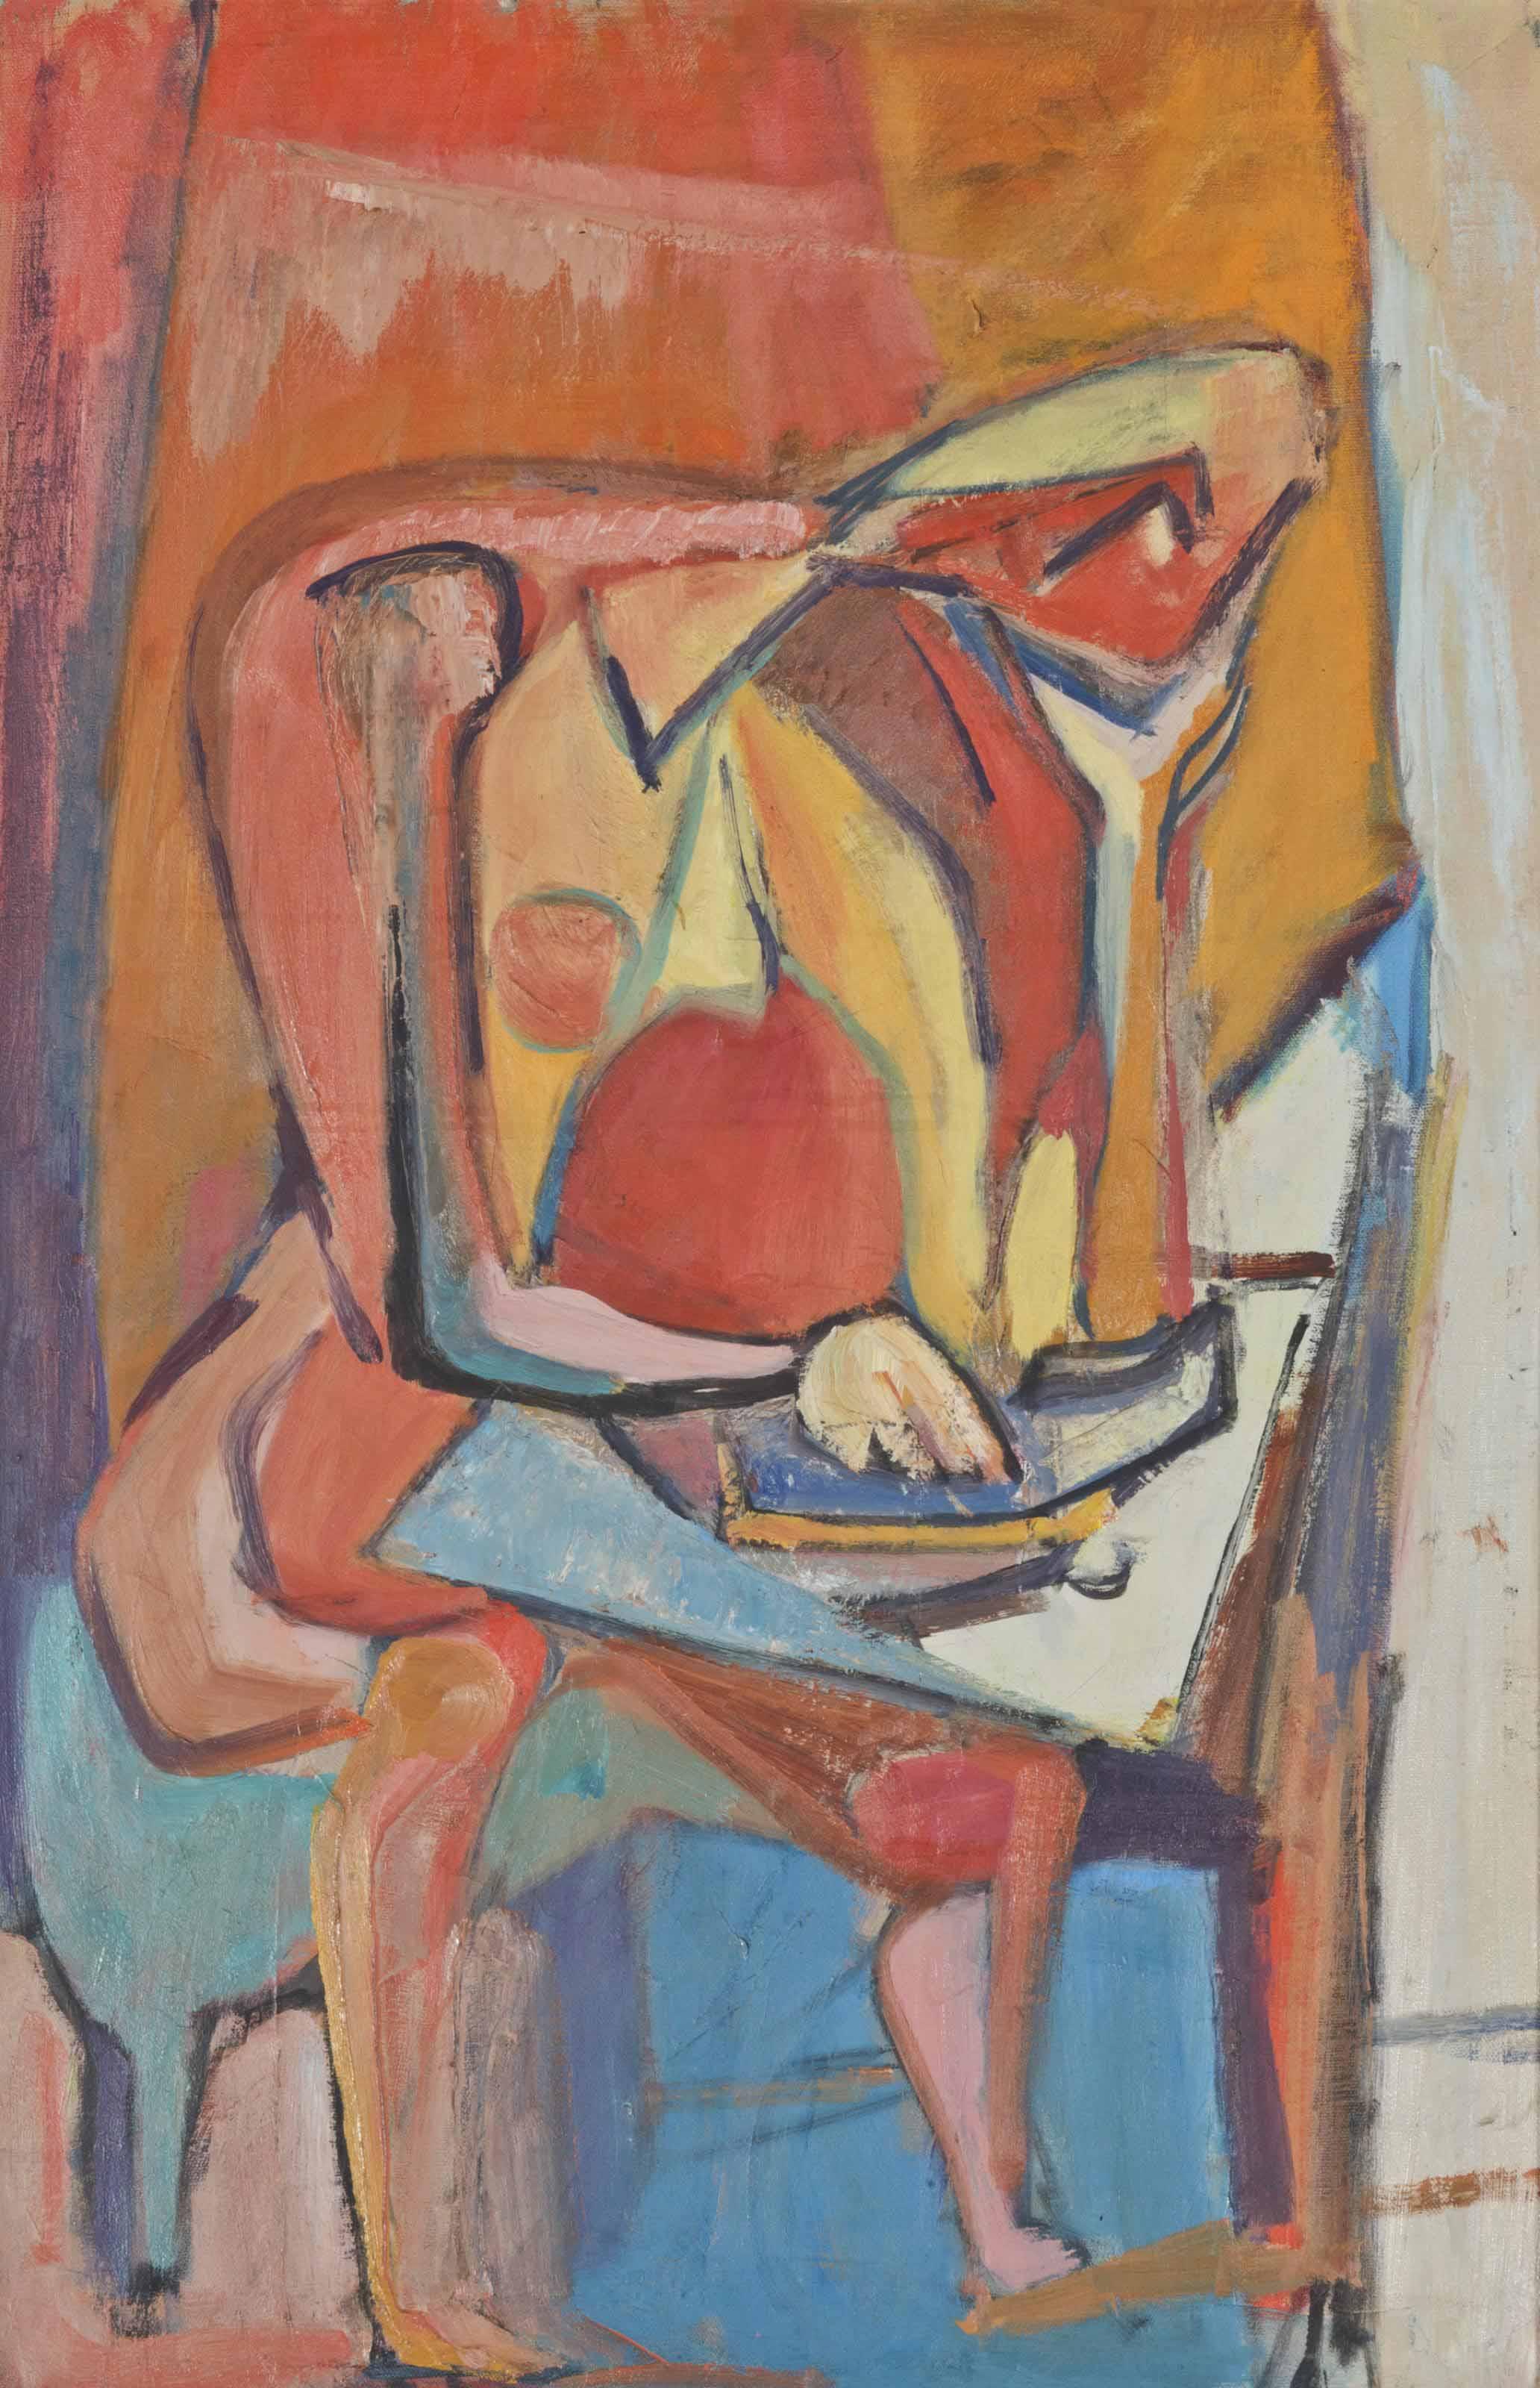 Paul Burlin (American, 1886-1969)